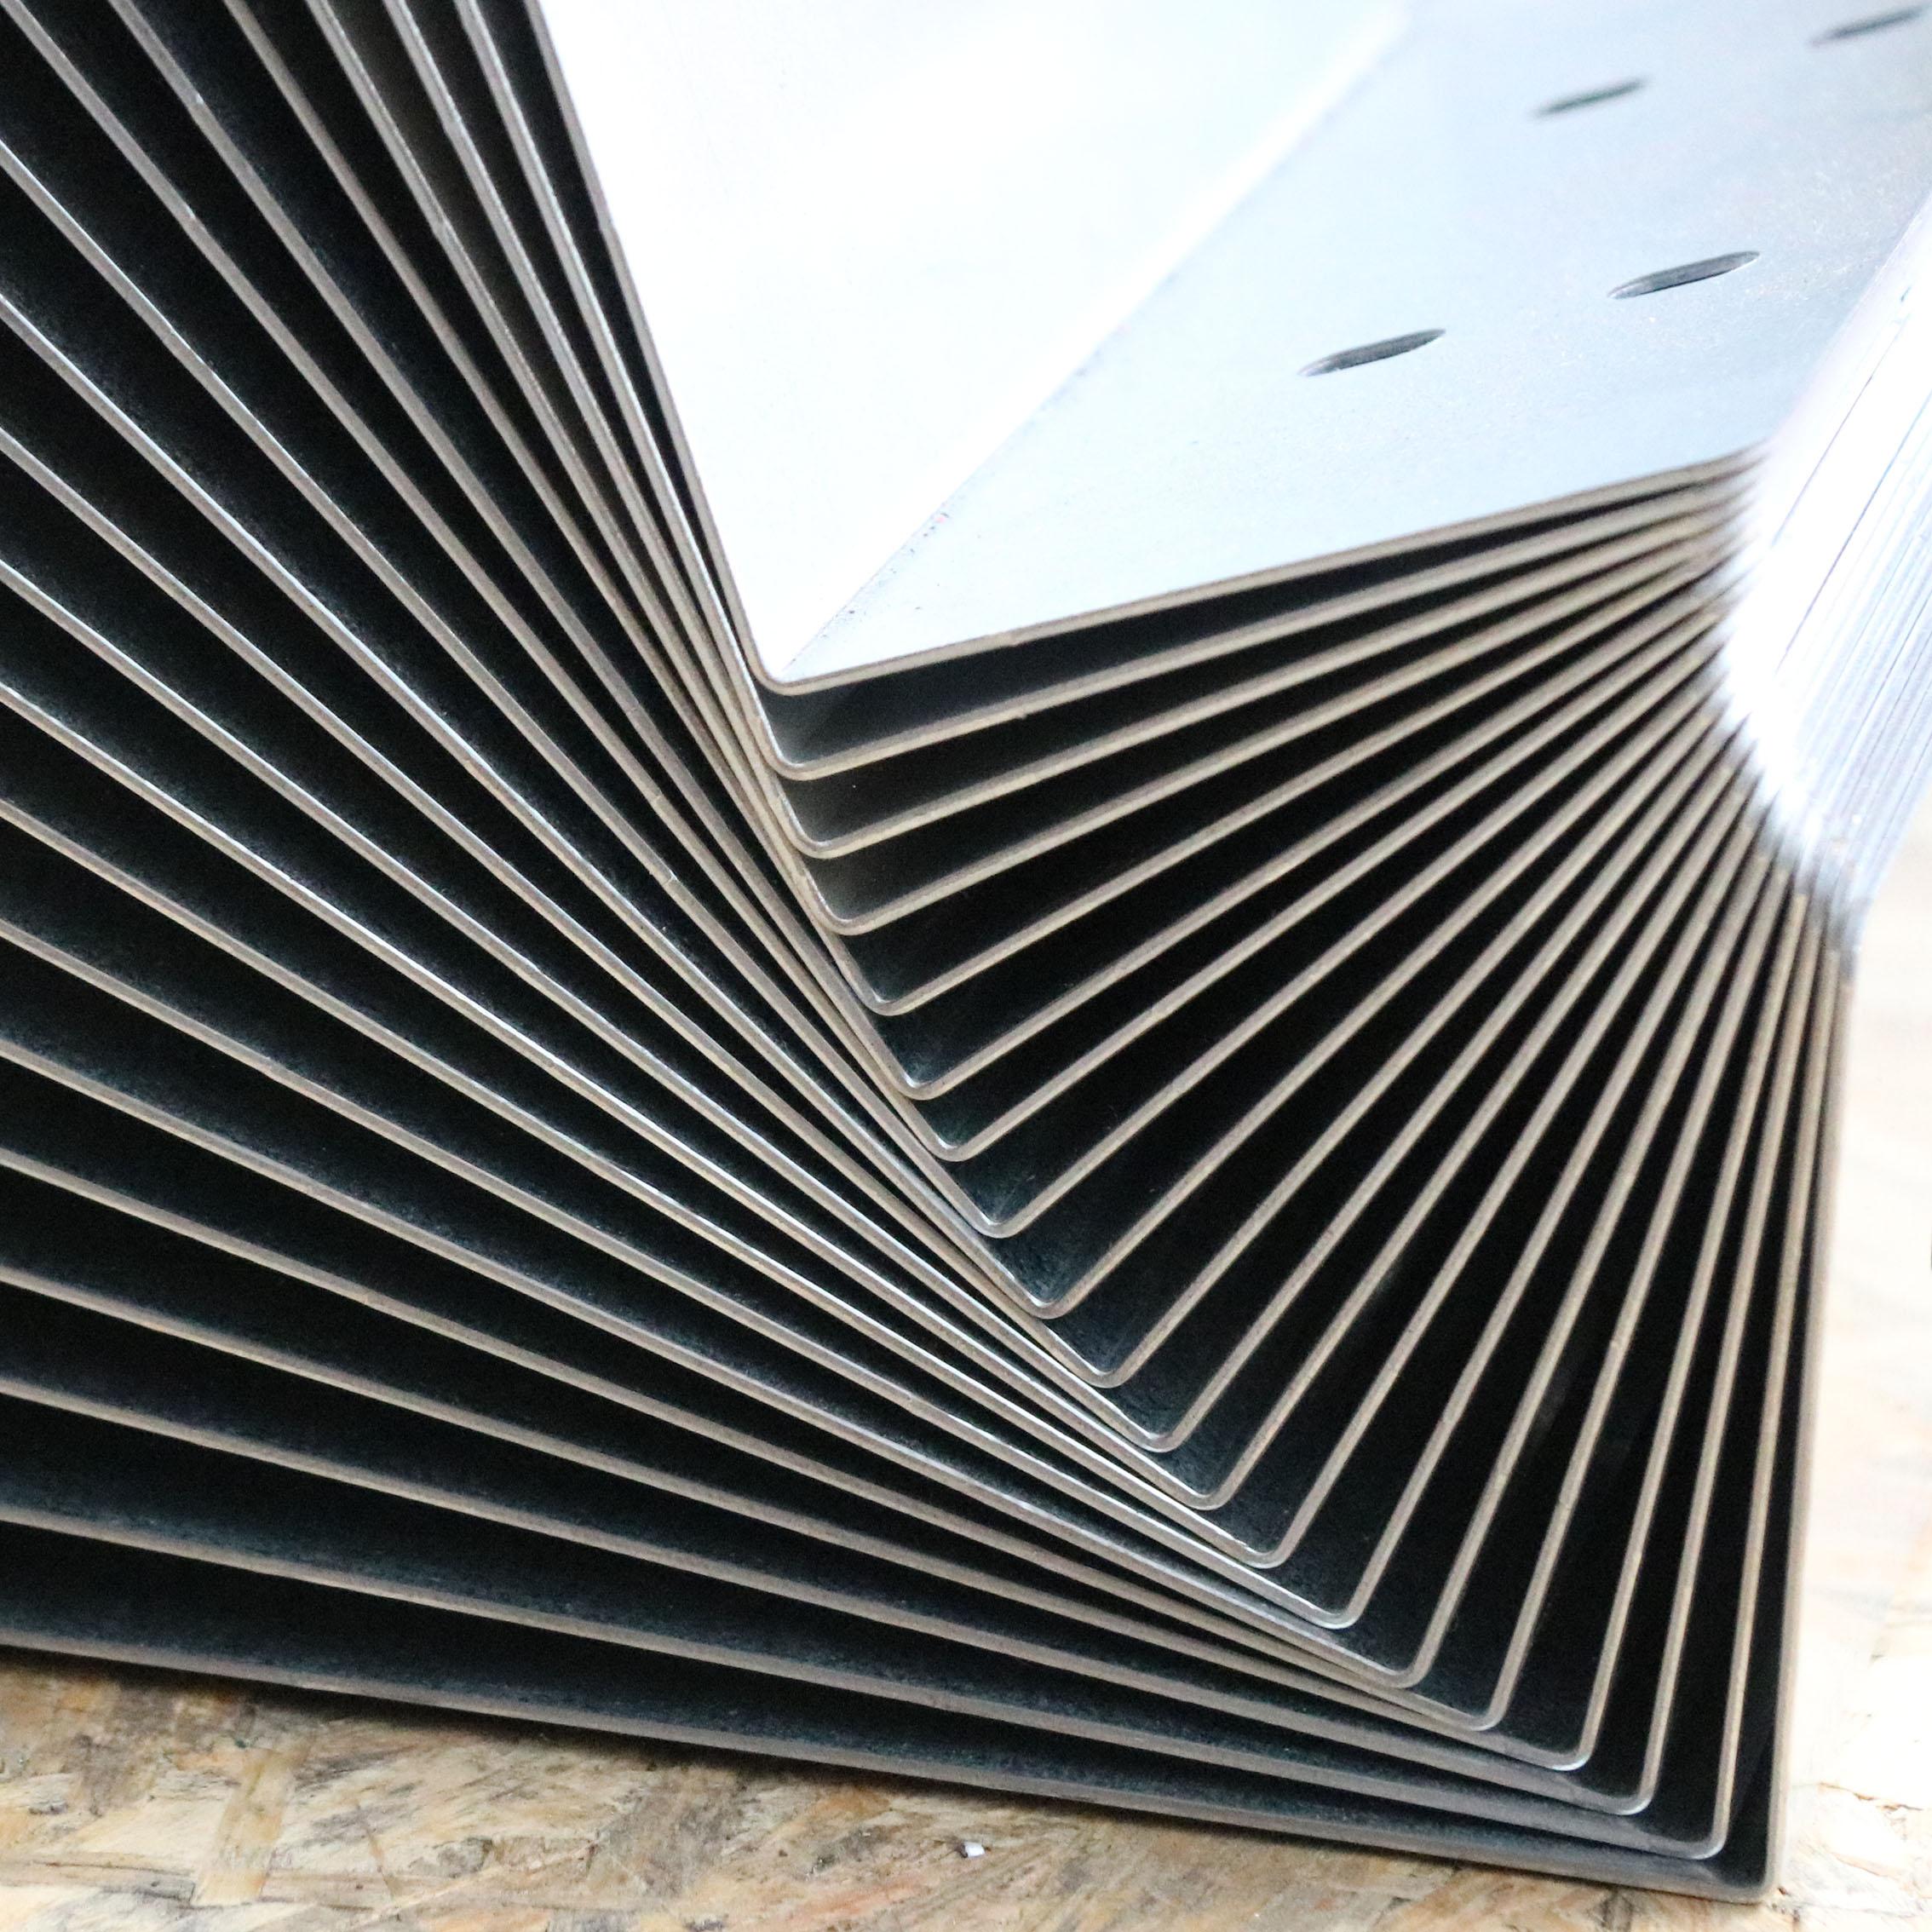 CNC Bending 3 - Alroys Sheet Metal